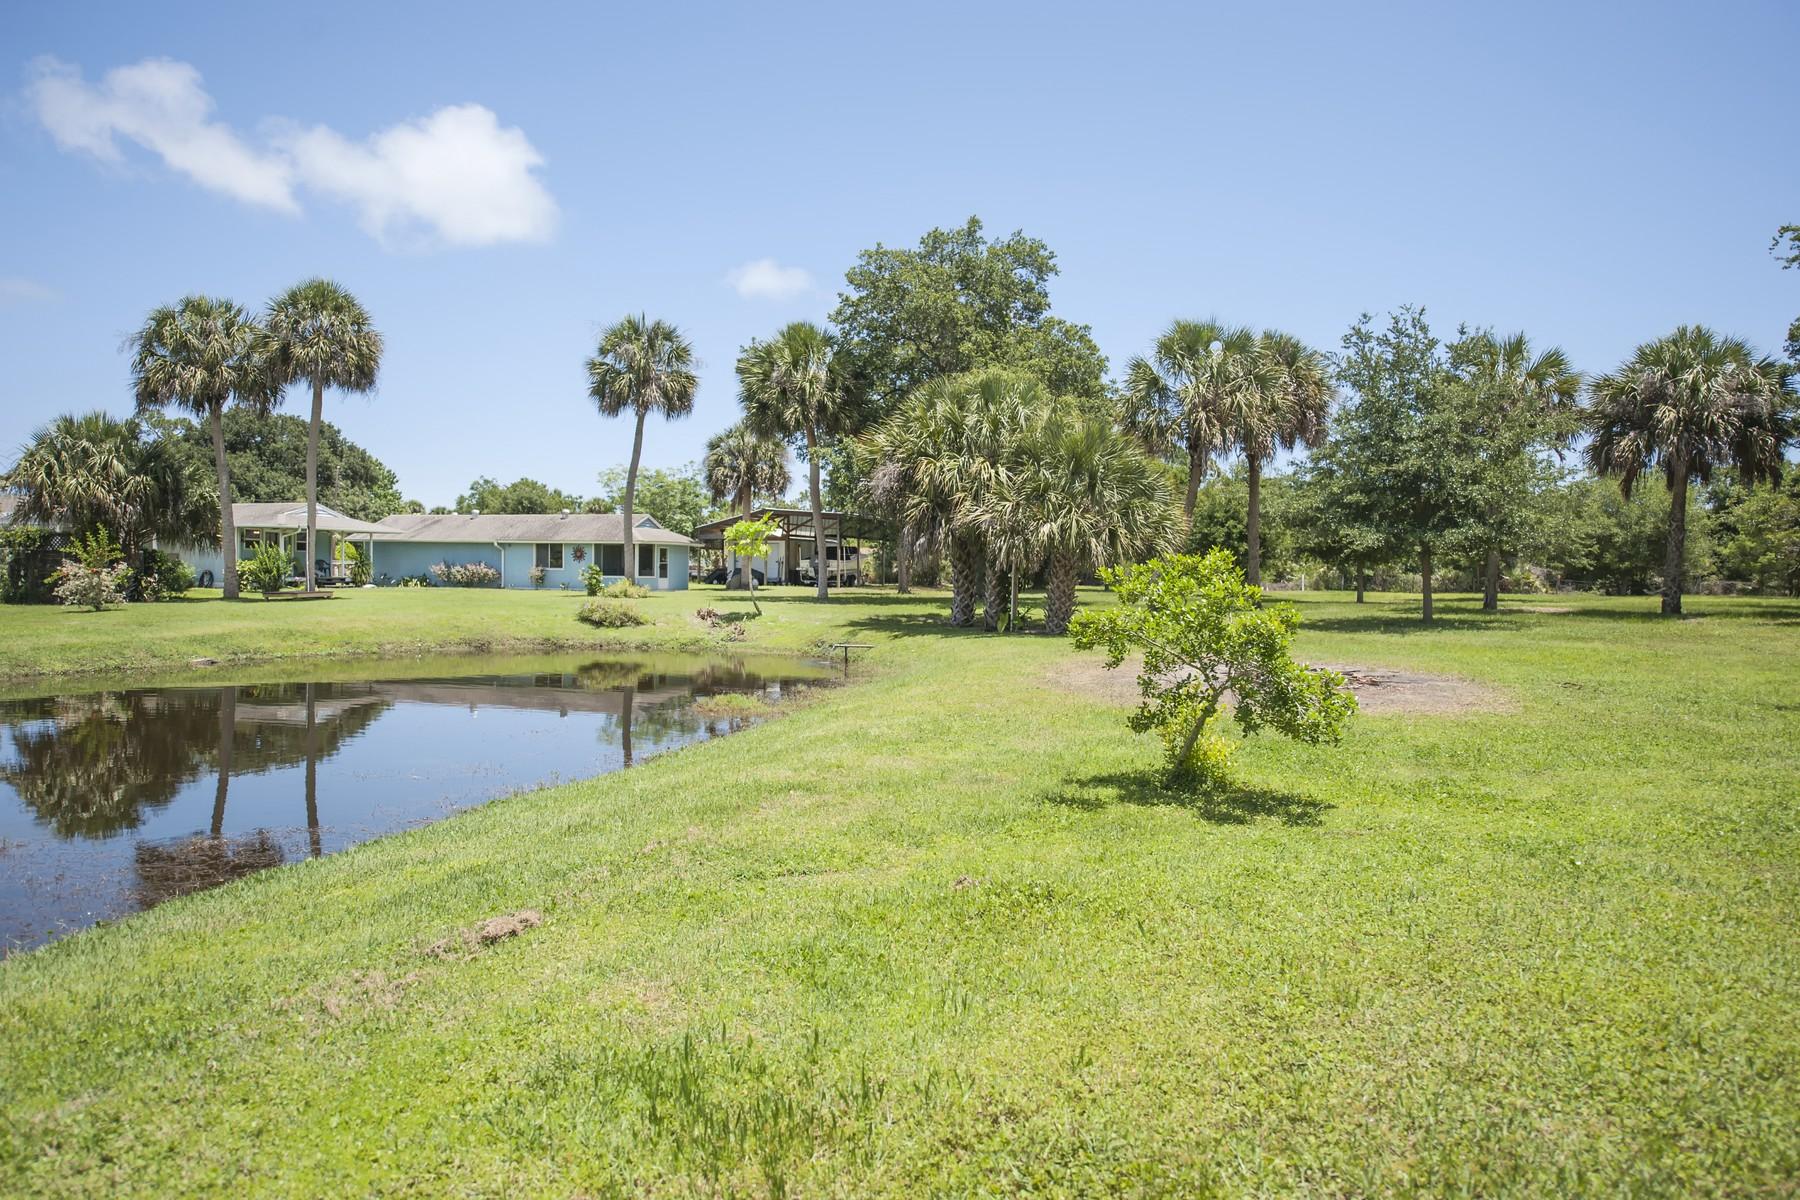 独户住宅 为 销售 在 True Florida home on almost 3 acres 3745 Main Street Micco, 佛罗里达州 32976 美国